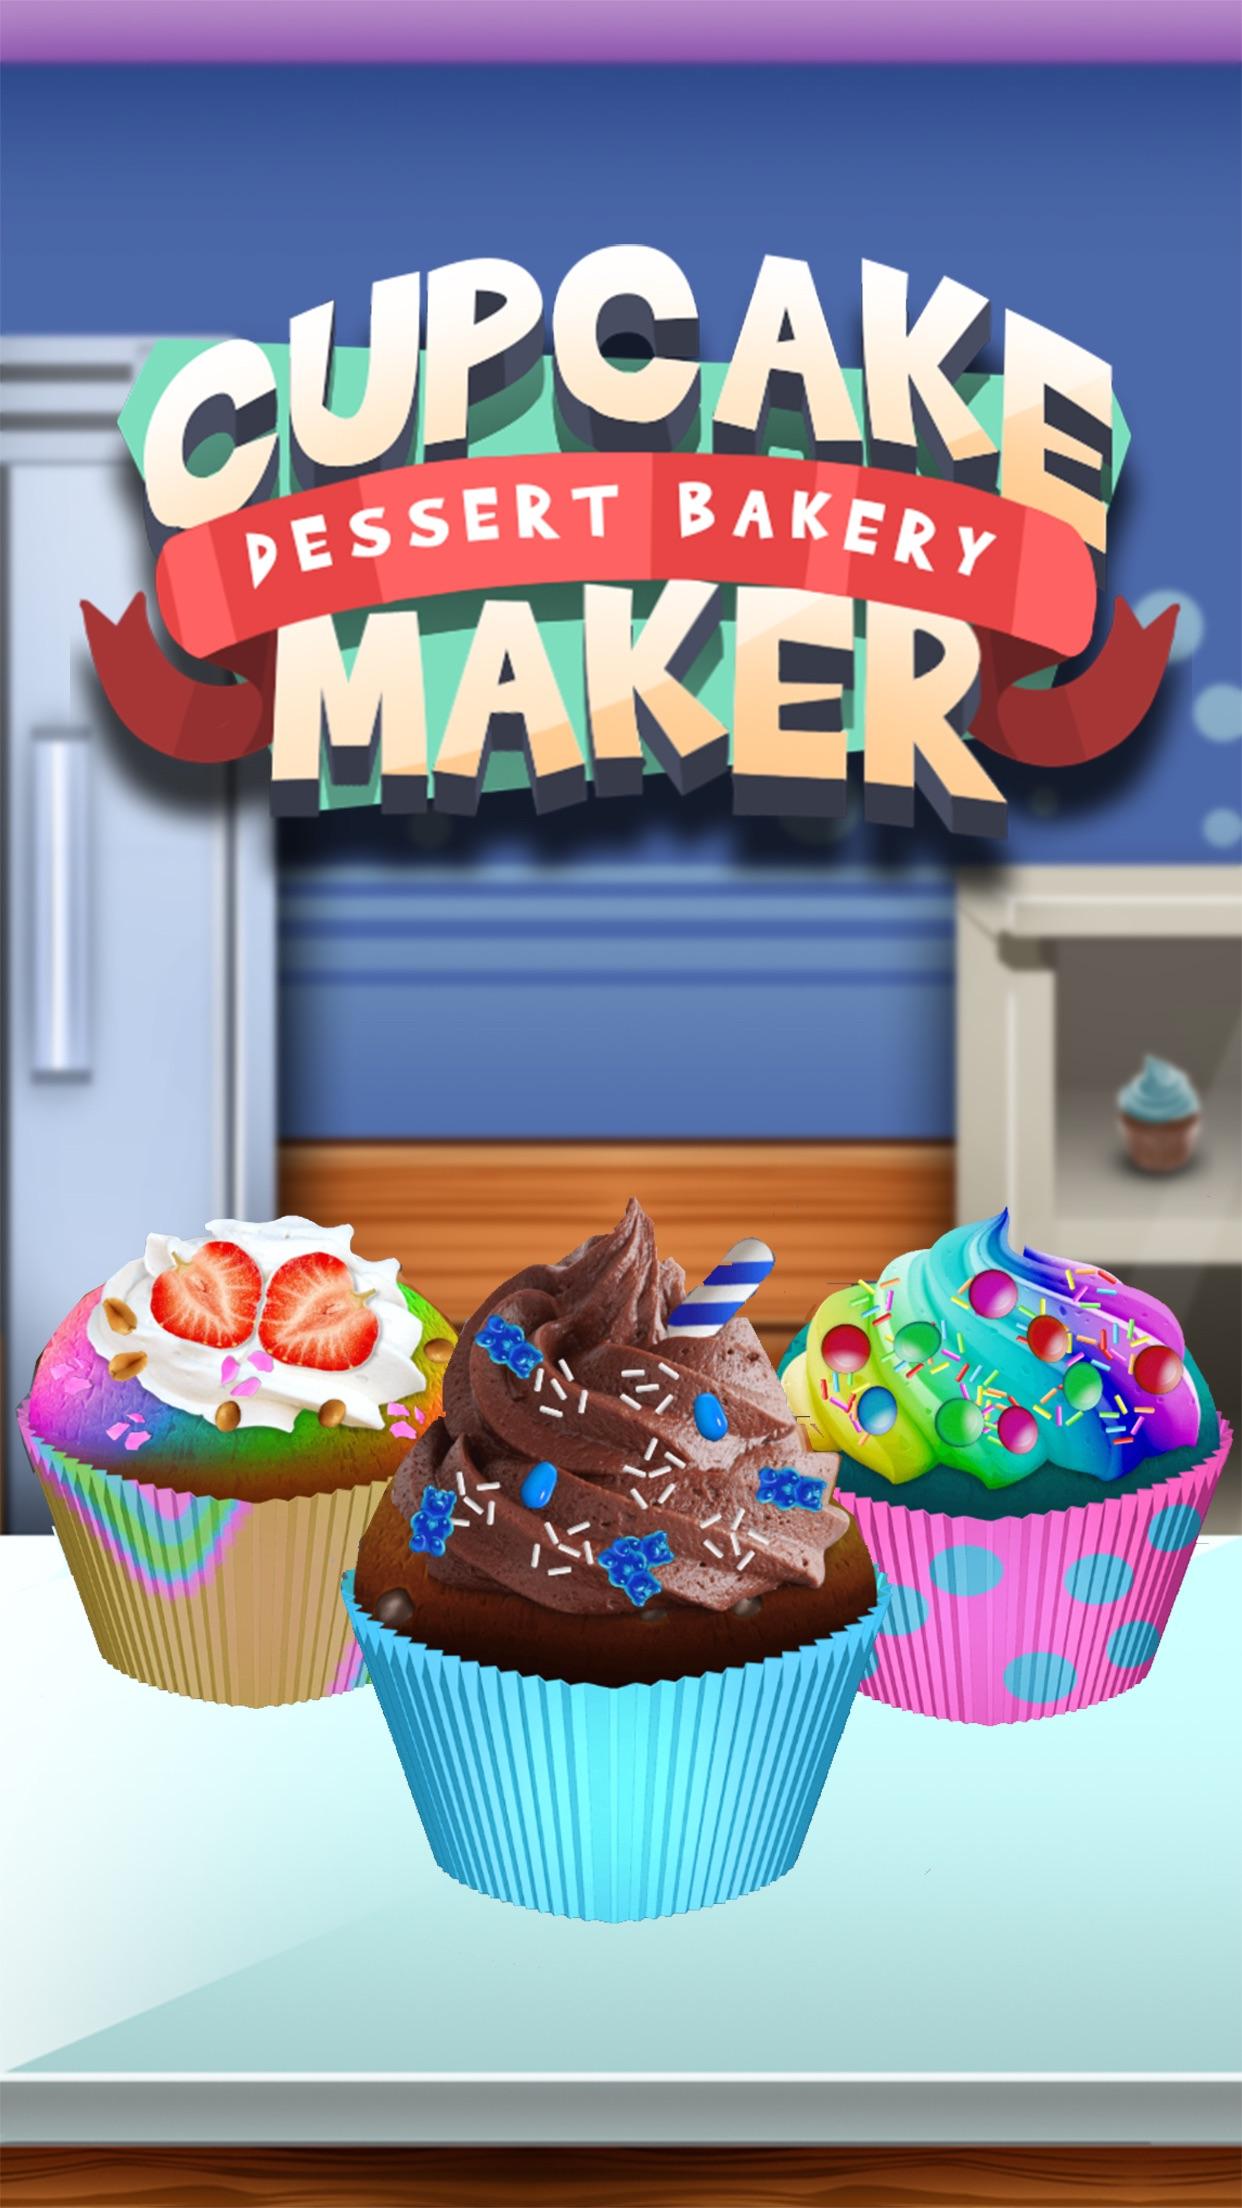 Awesome Ice Cream Cupcake Maker - Baking Dessert Screenshot